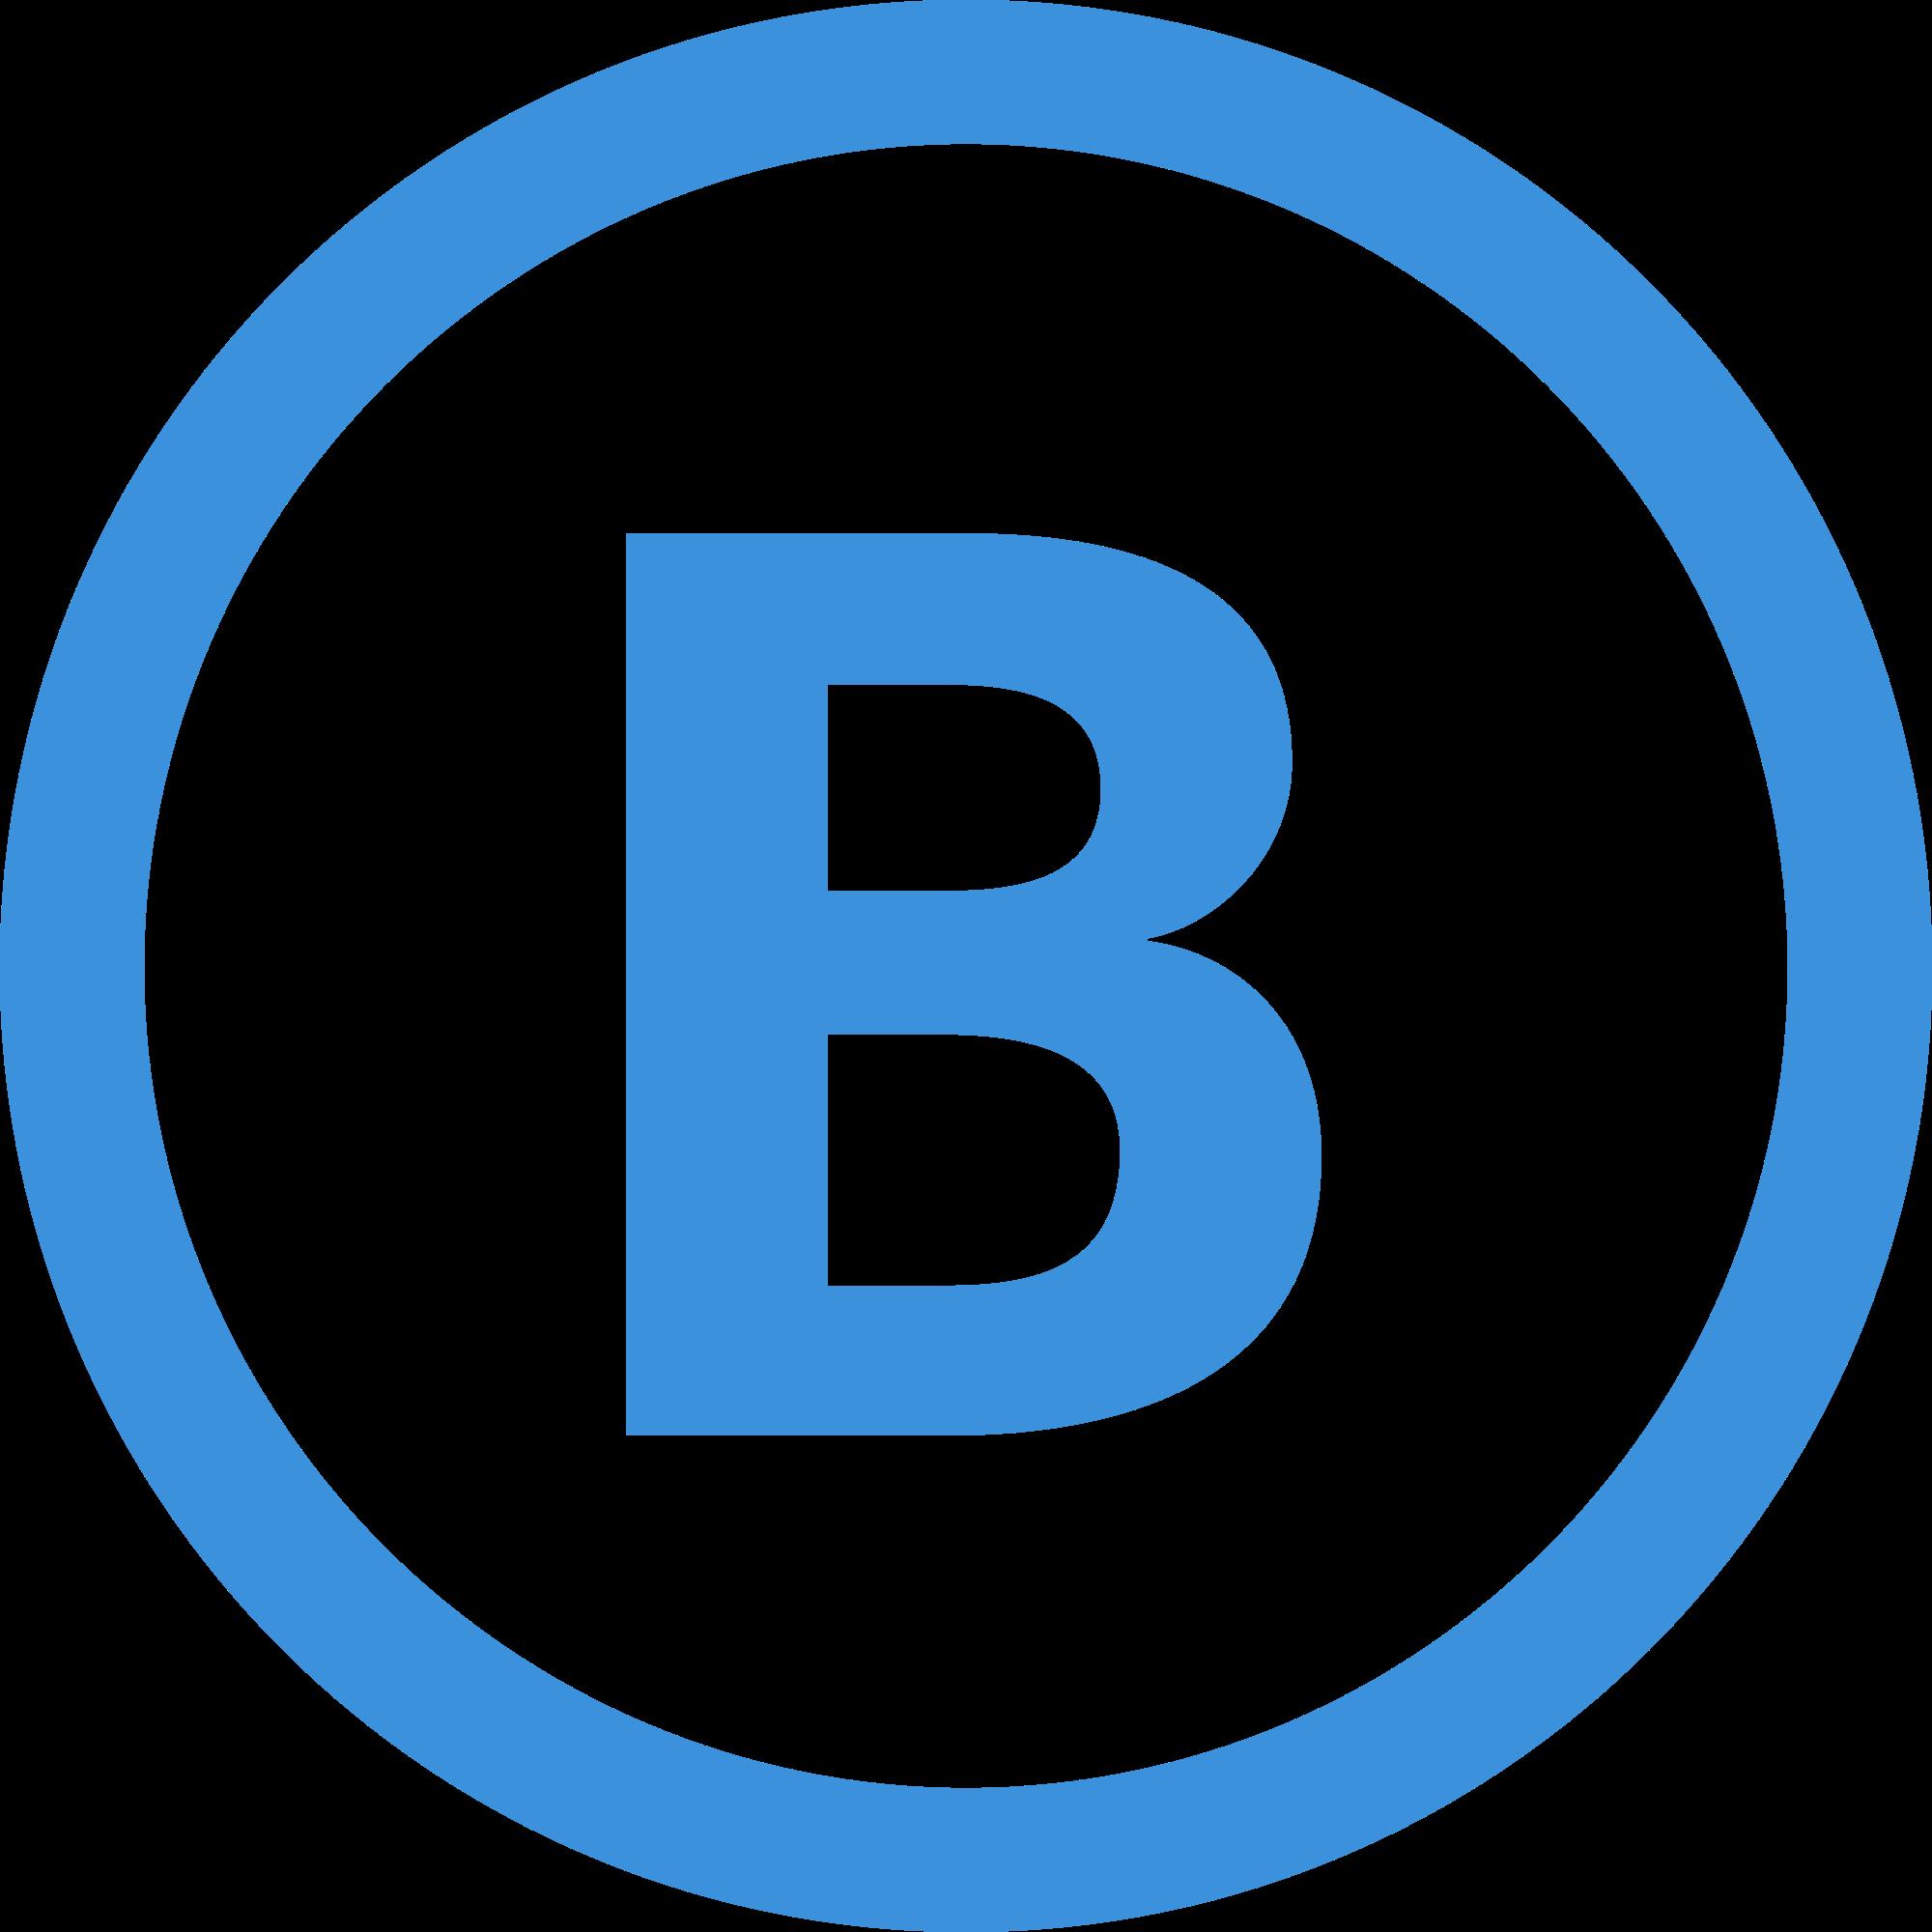 Line B icon